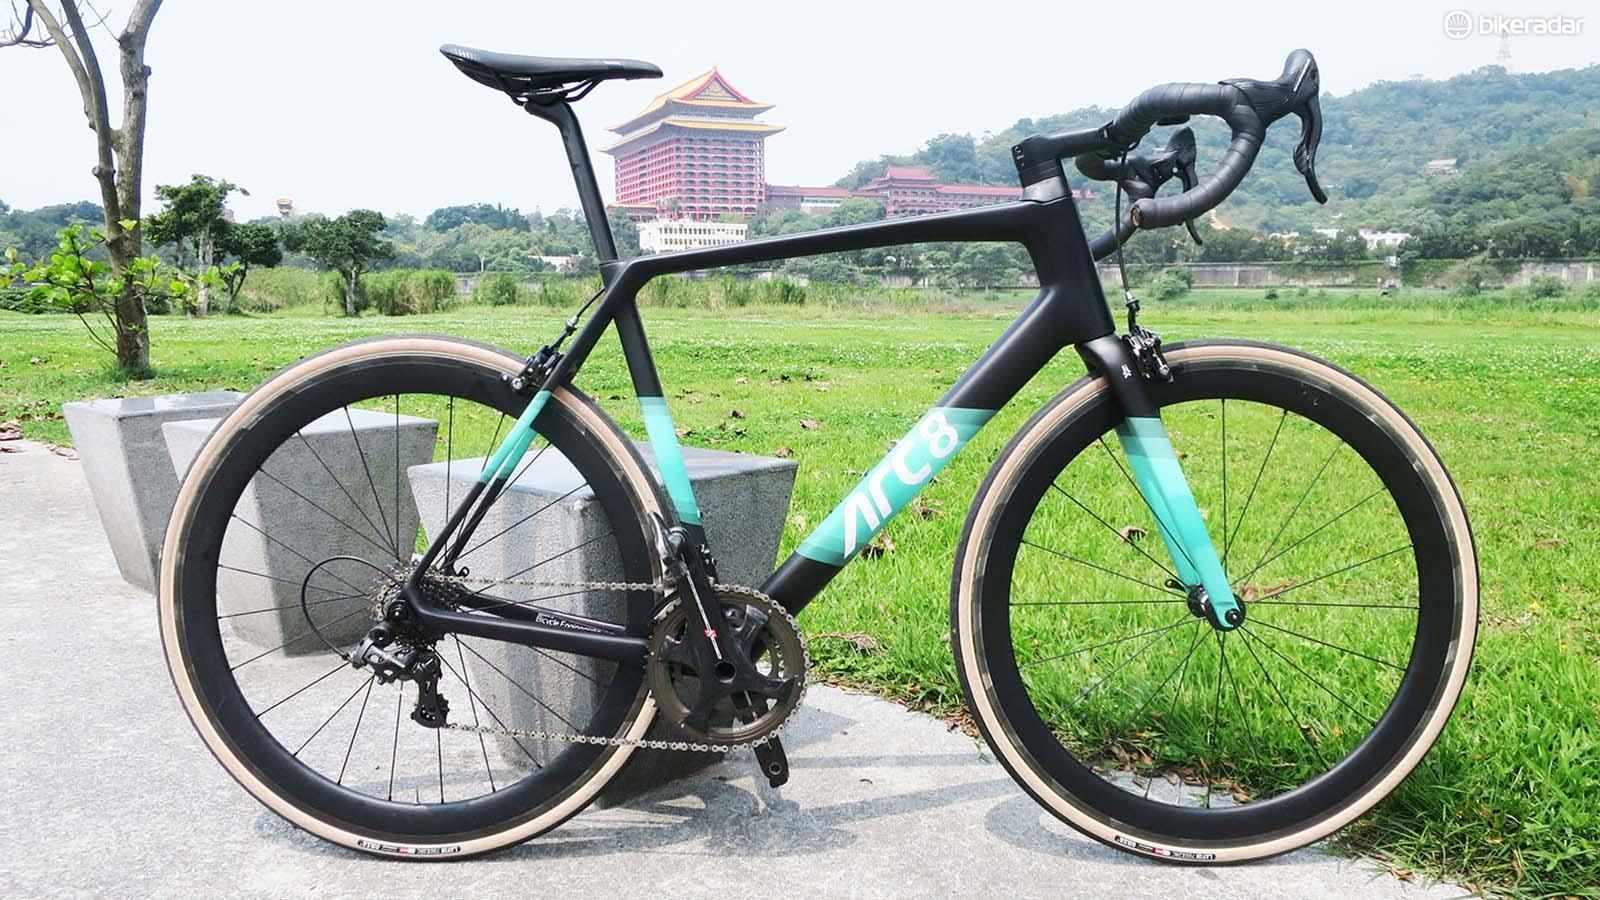 Arc8's debut road bike the Escapee